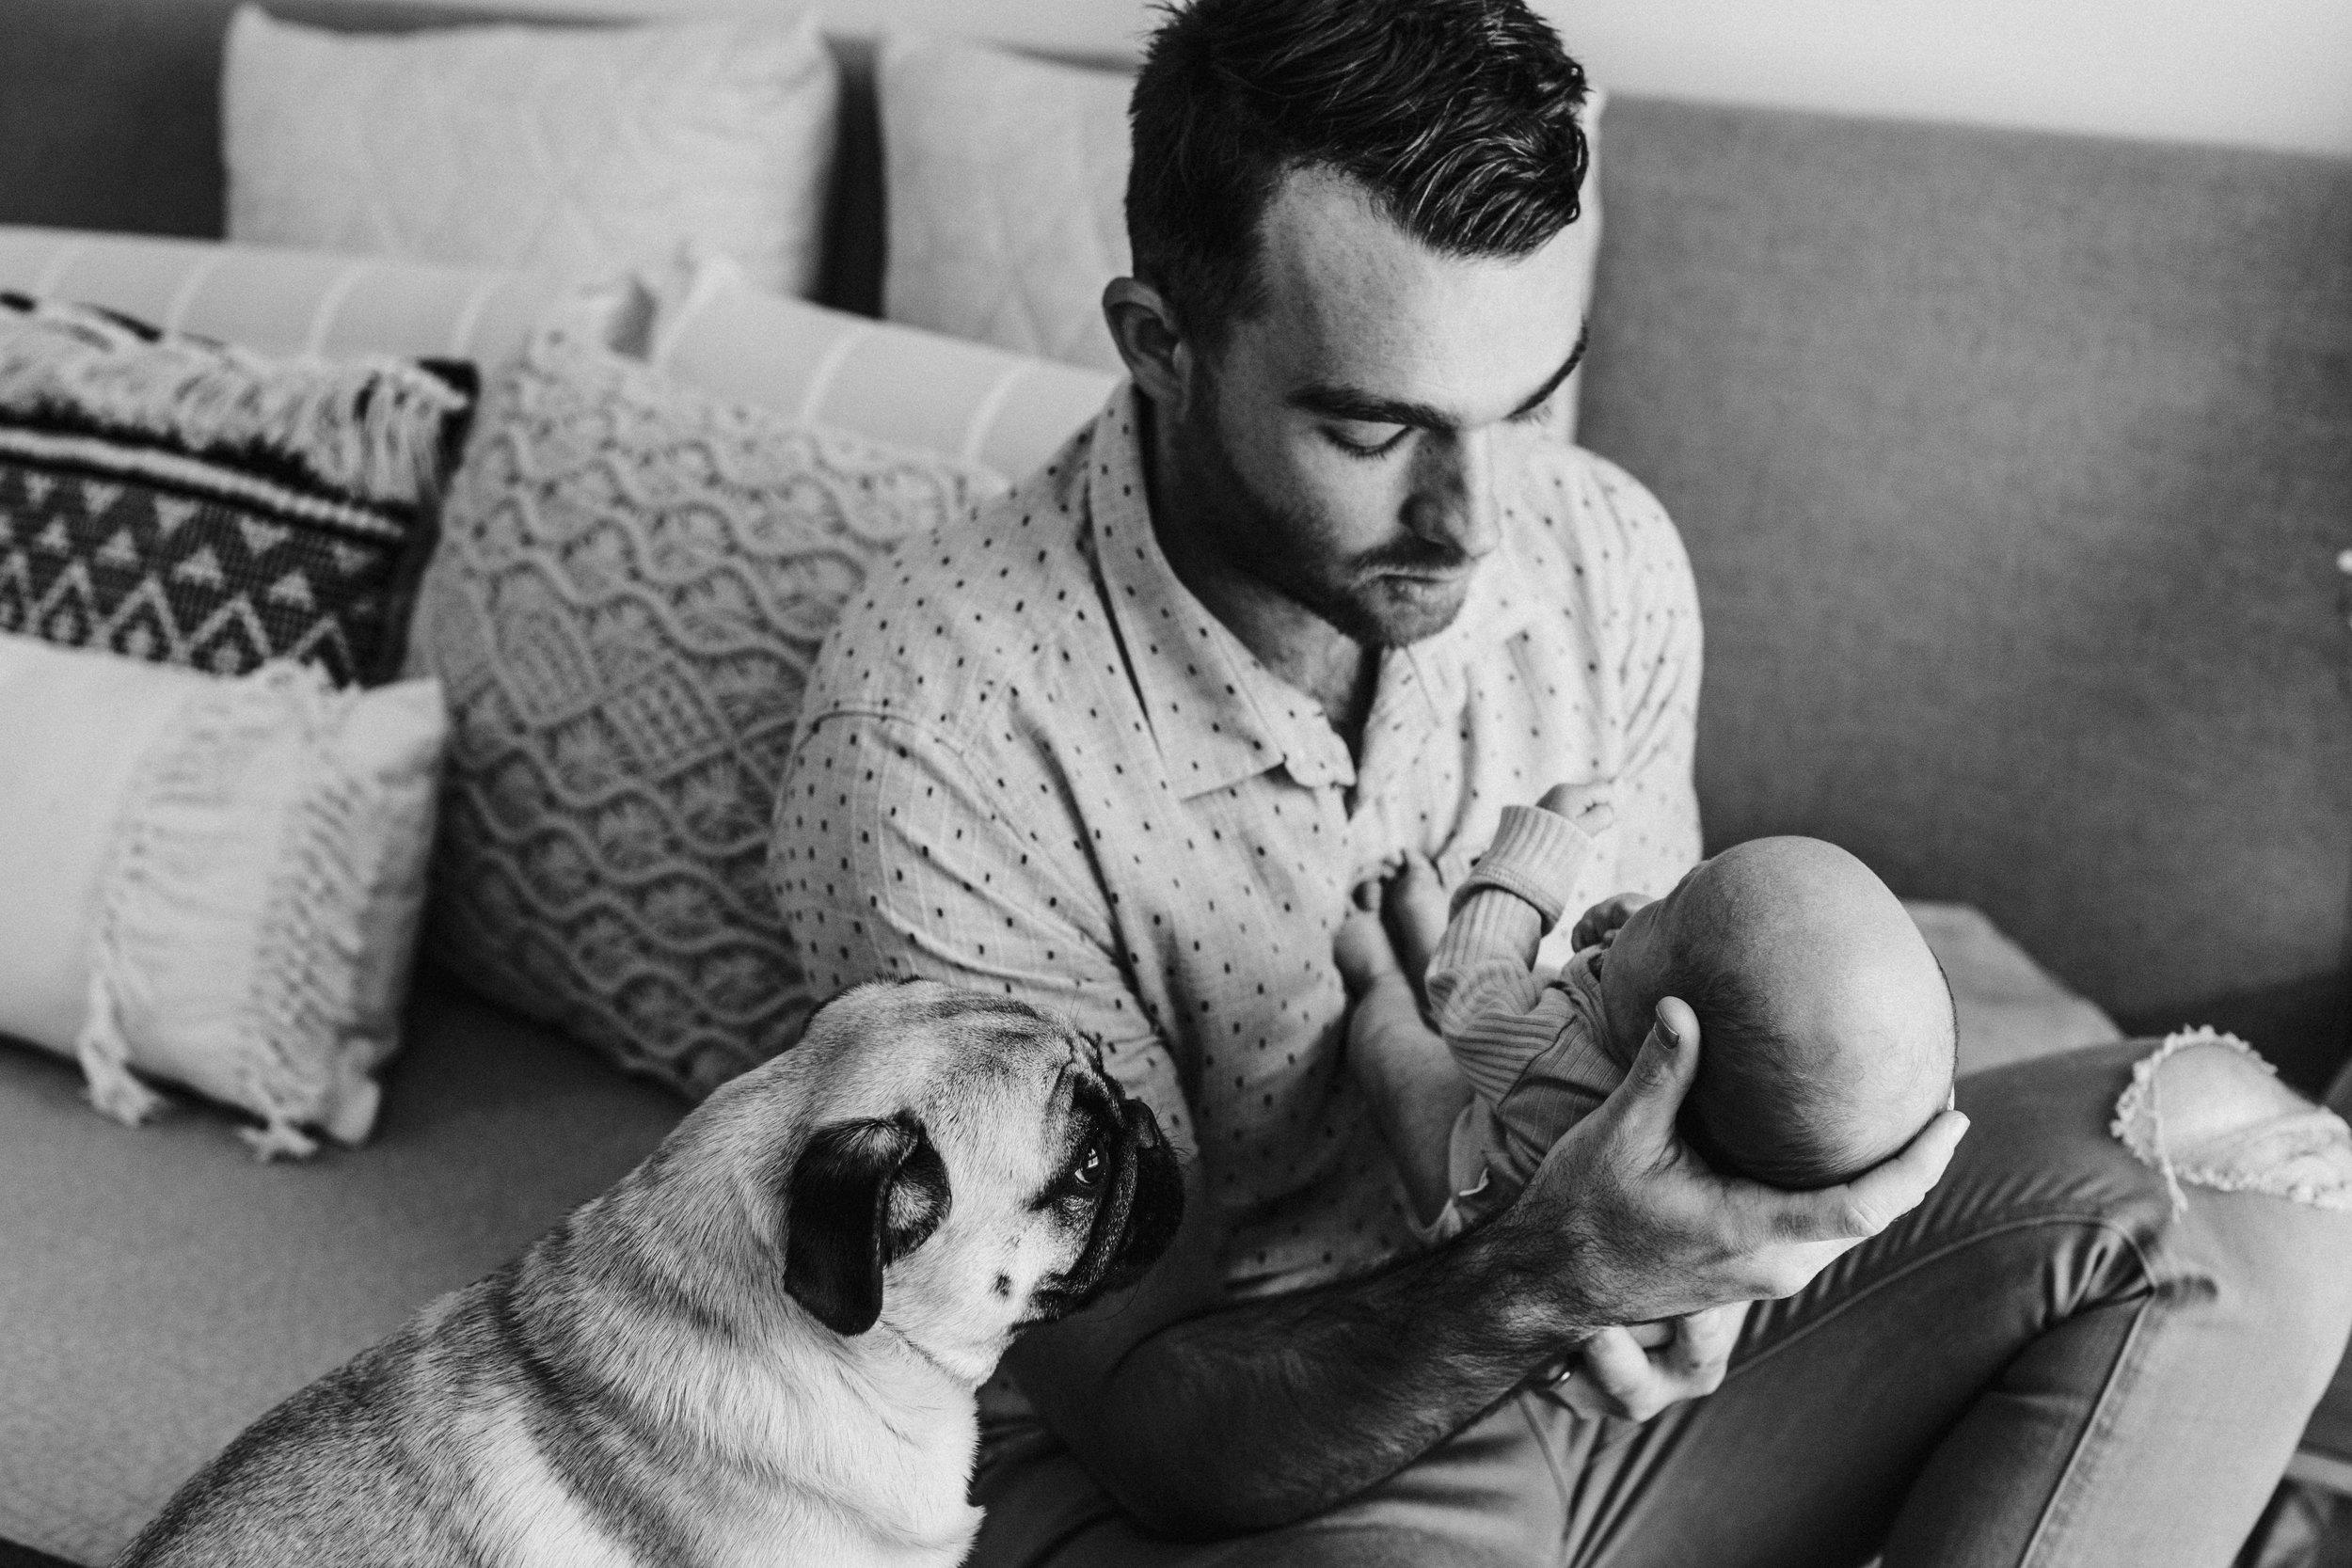 twin-newborn-photography-camden-macarthur-30.jpg